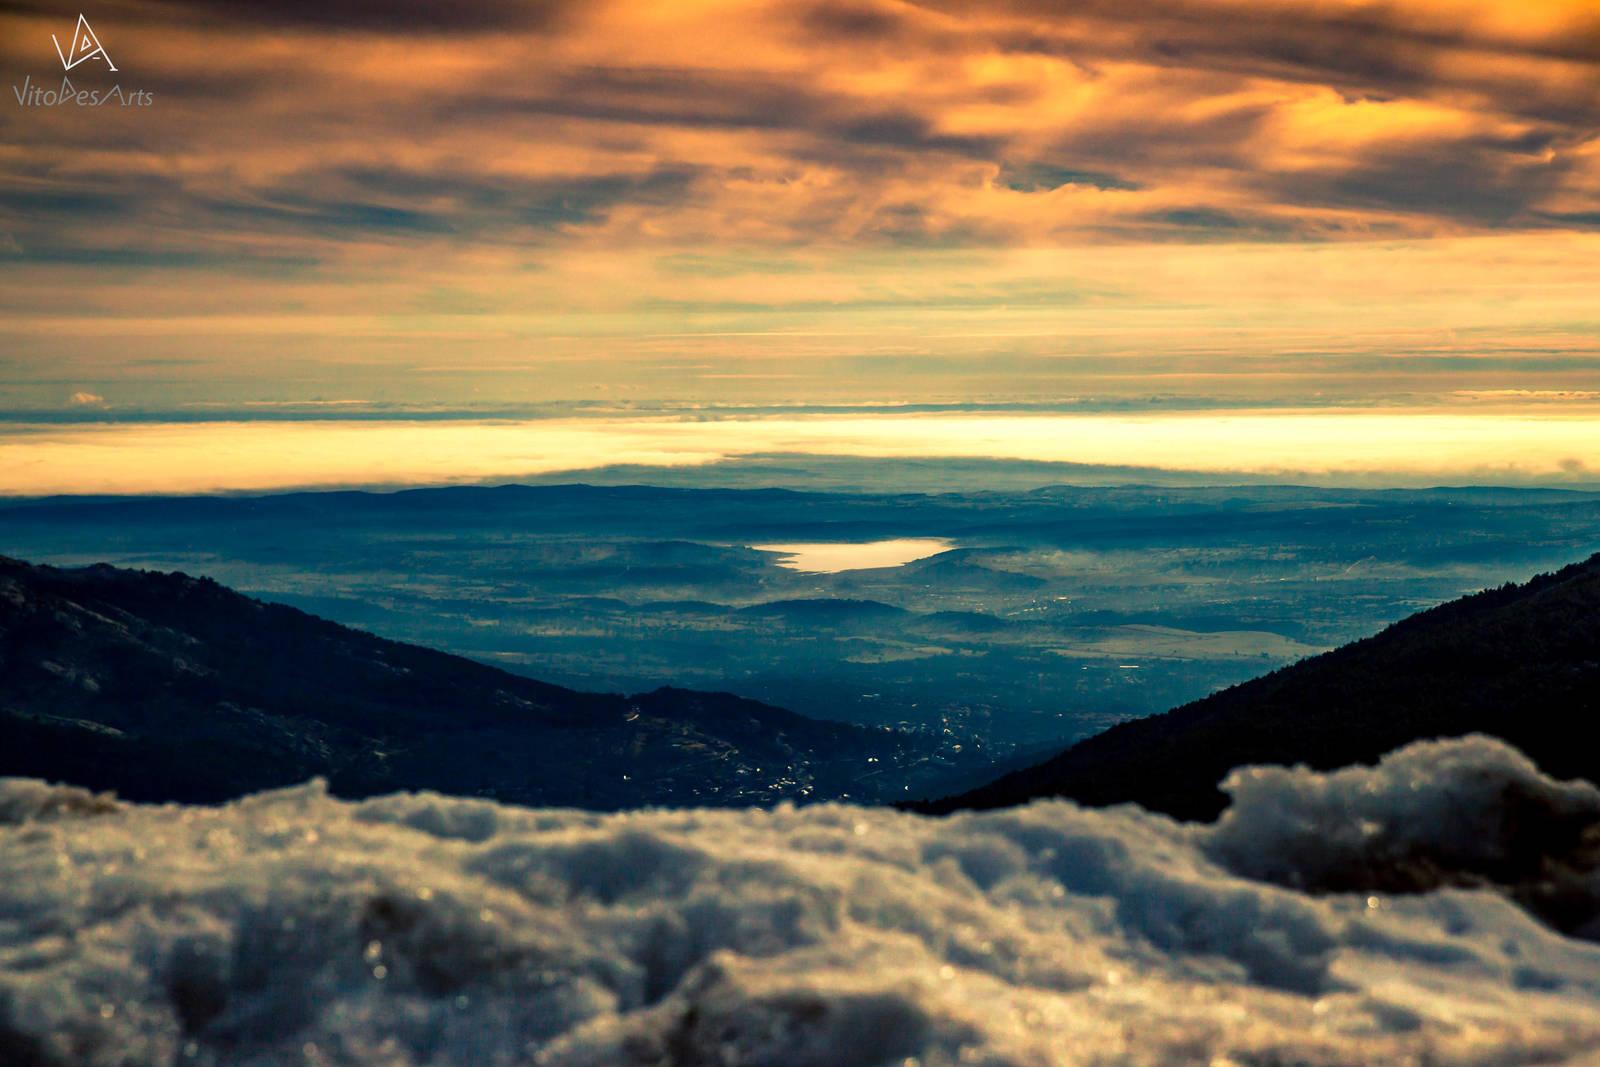 Morning fog by VitoDesArts